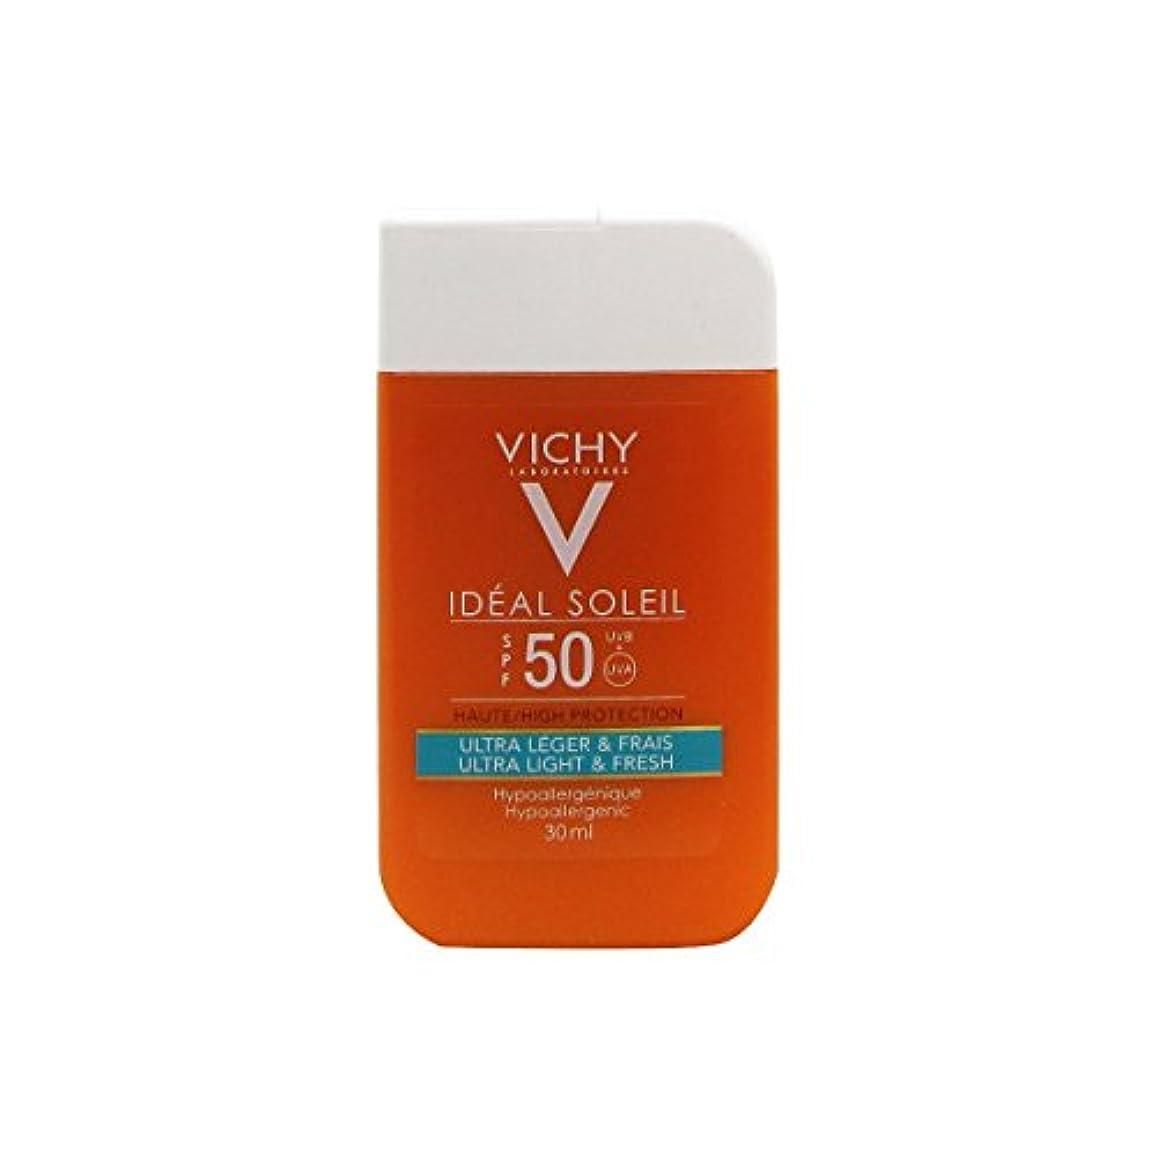 保有者佐賀浜辺Vichy Ideal Soleil Mini Pocket Size Ultra Fresh And Light Spf50 30ml [並行輸入品]